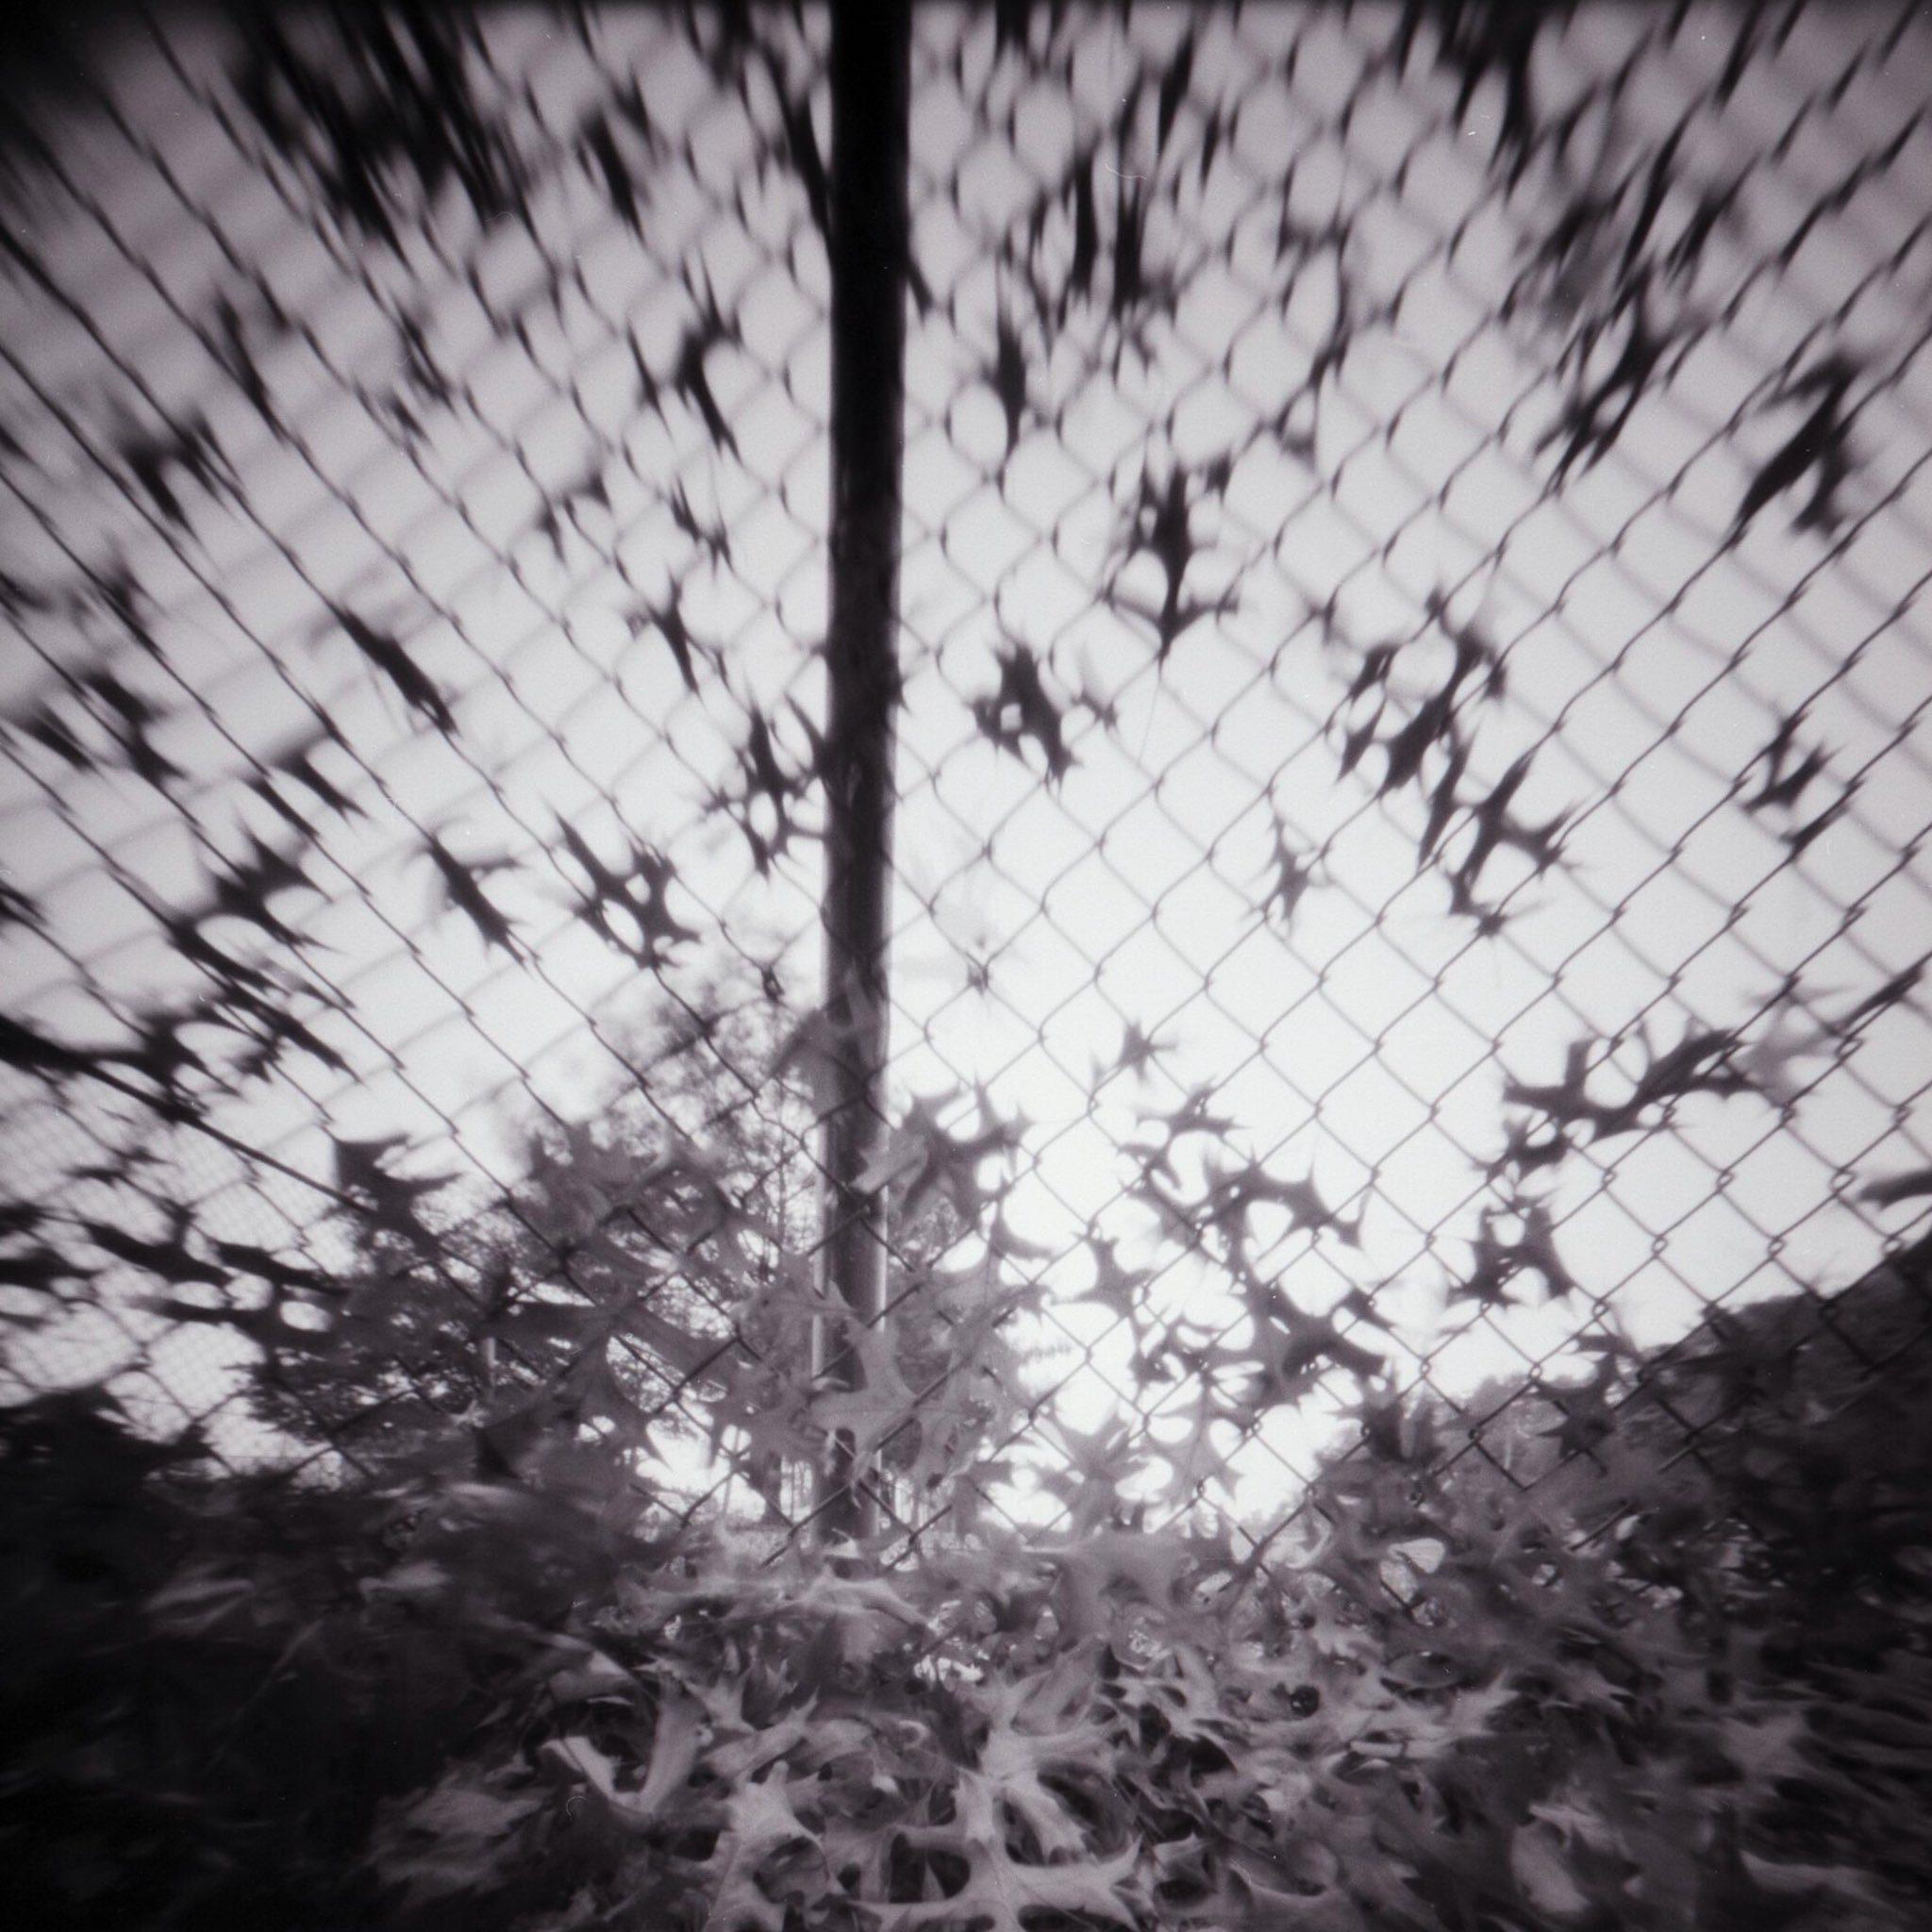 @DrMarsRover · Oct 3 . @ILFORDPhoto Delta 100 RSS 6x6 #pinhole #ilfordphoto #fridayfavourites #patterns